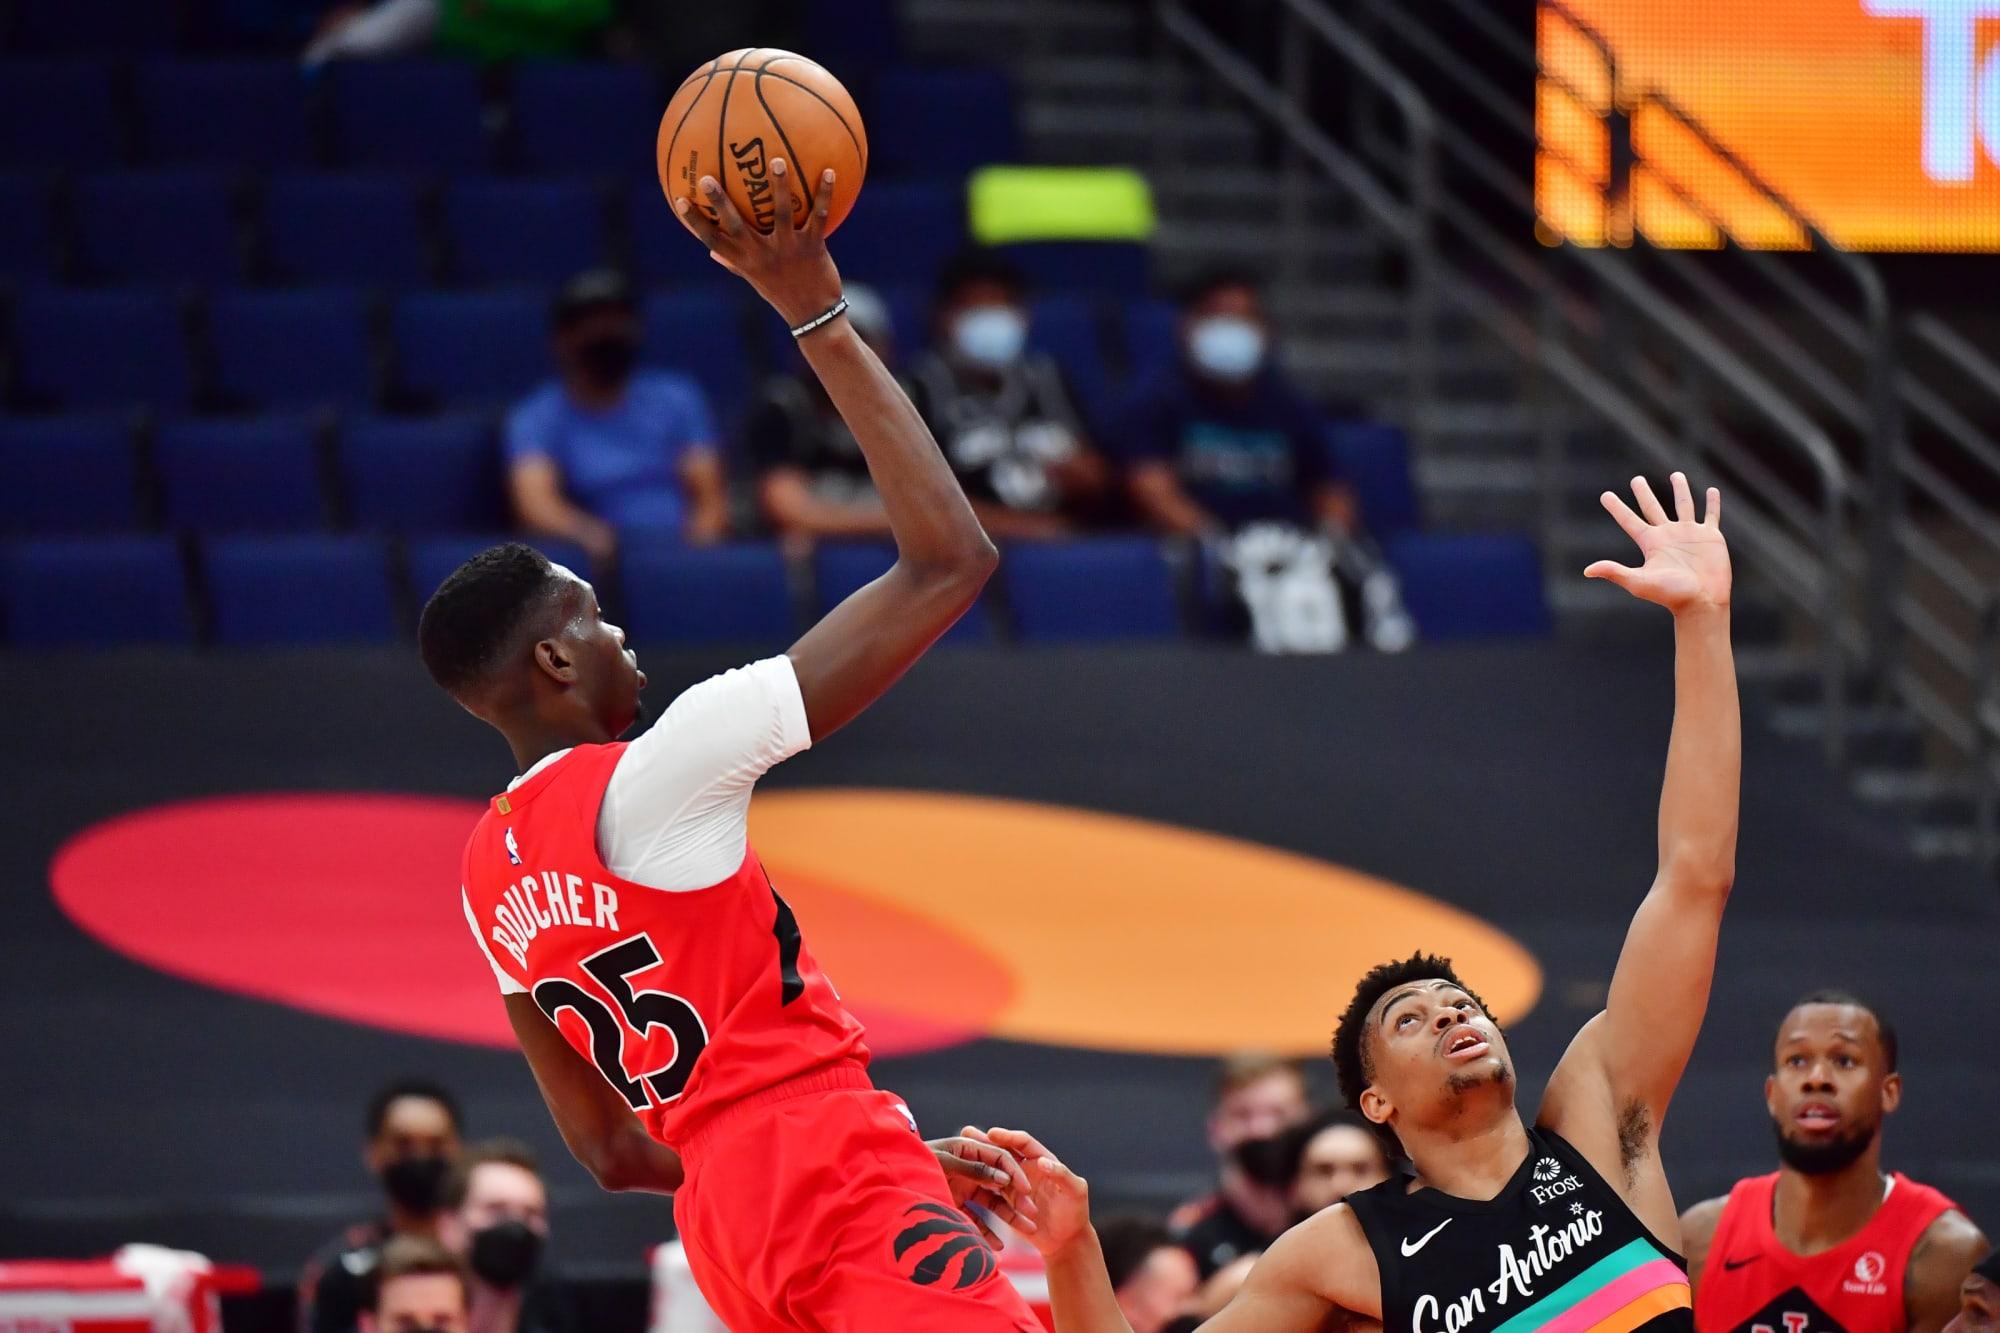 Toronto Raptors: Frontcourt surprisingly leads Raptors to win over feisty Spurs team